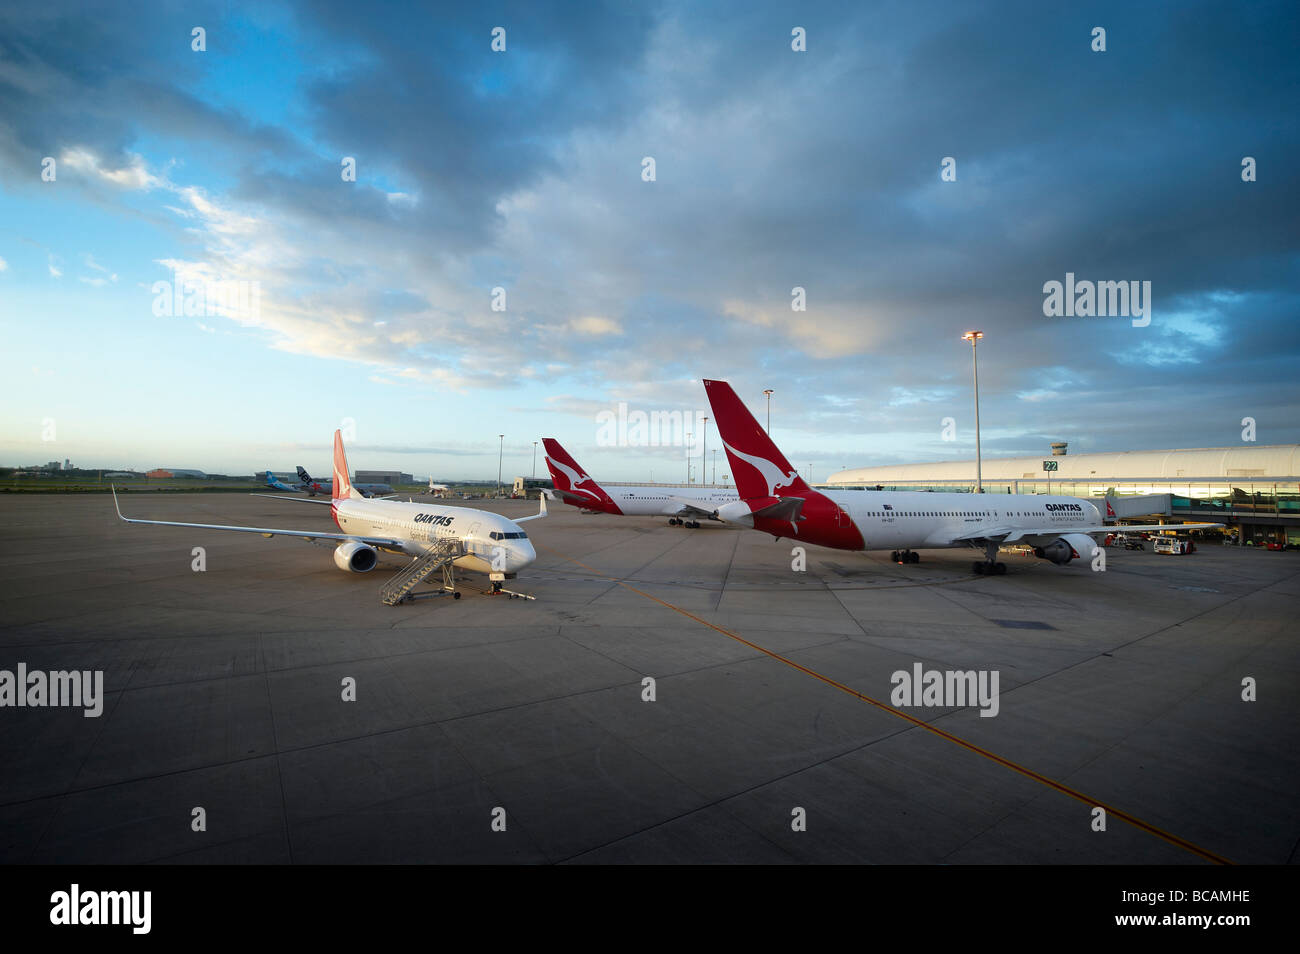 Qantas jets at airport terminal - Stock Image